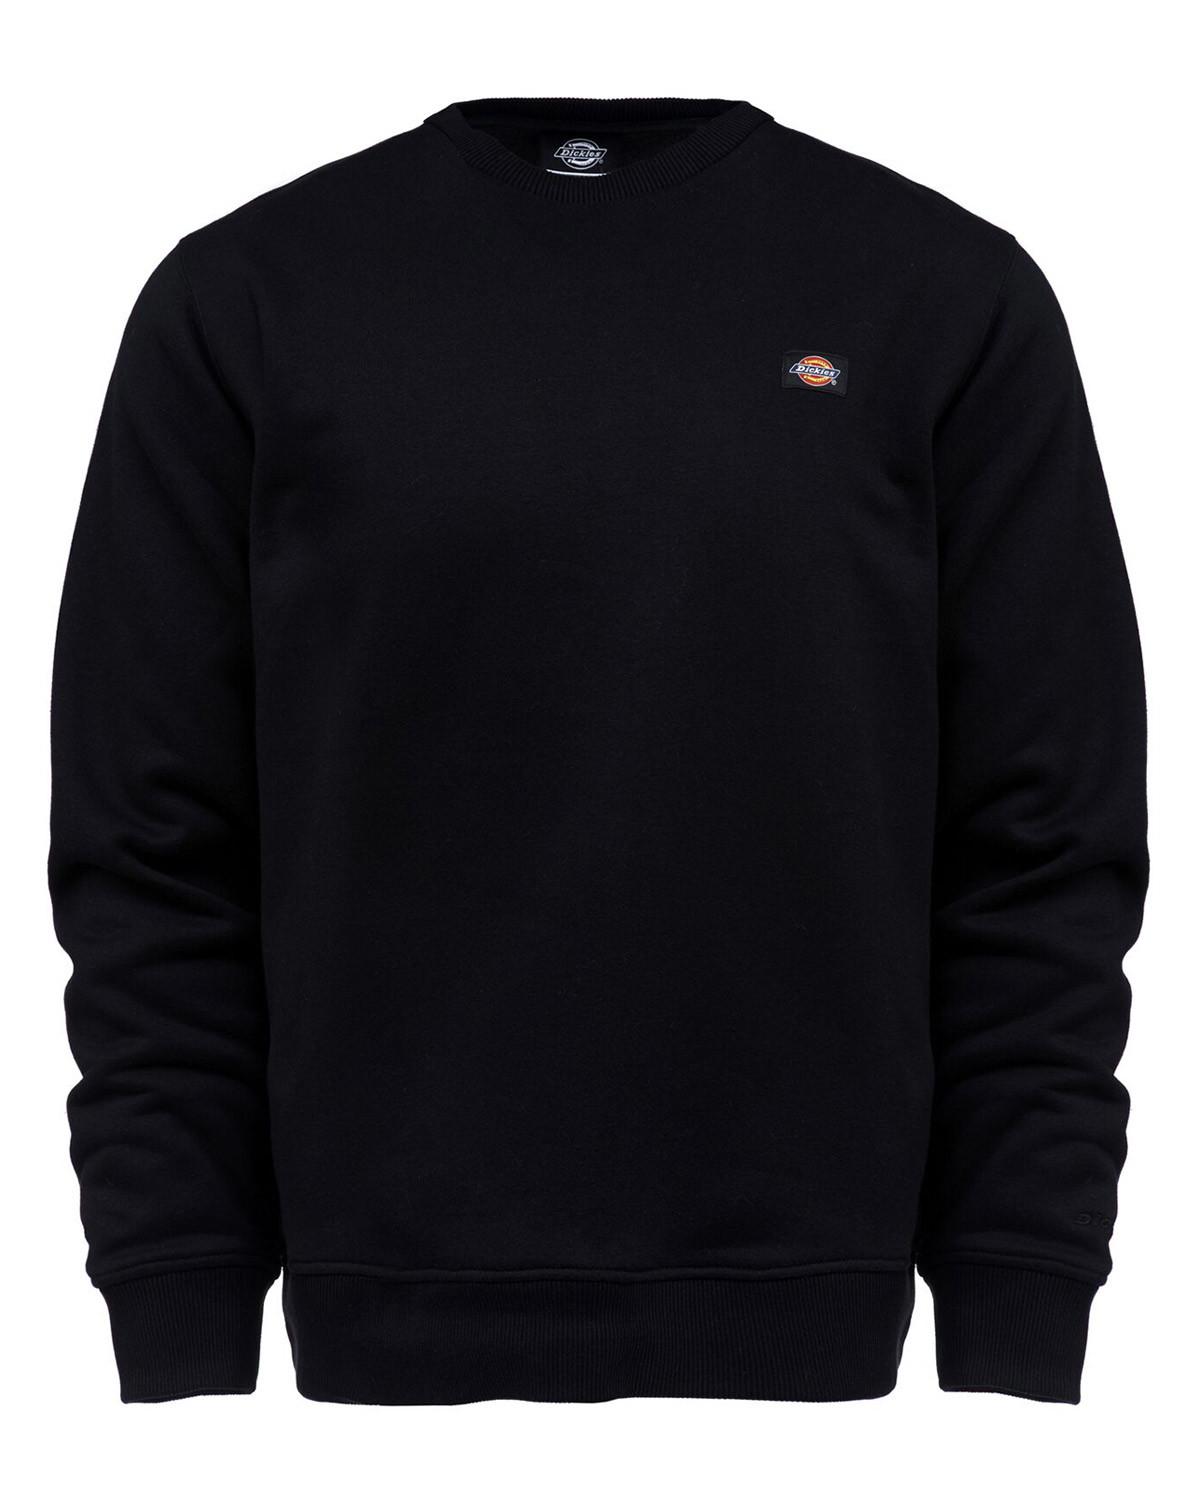 Dickies New Jersey Sweatshirt (Black, XS)